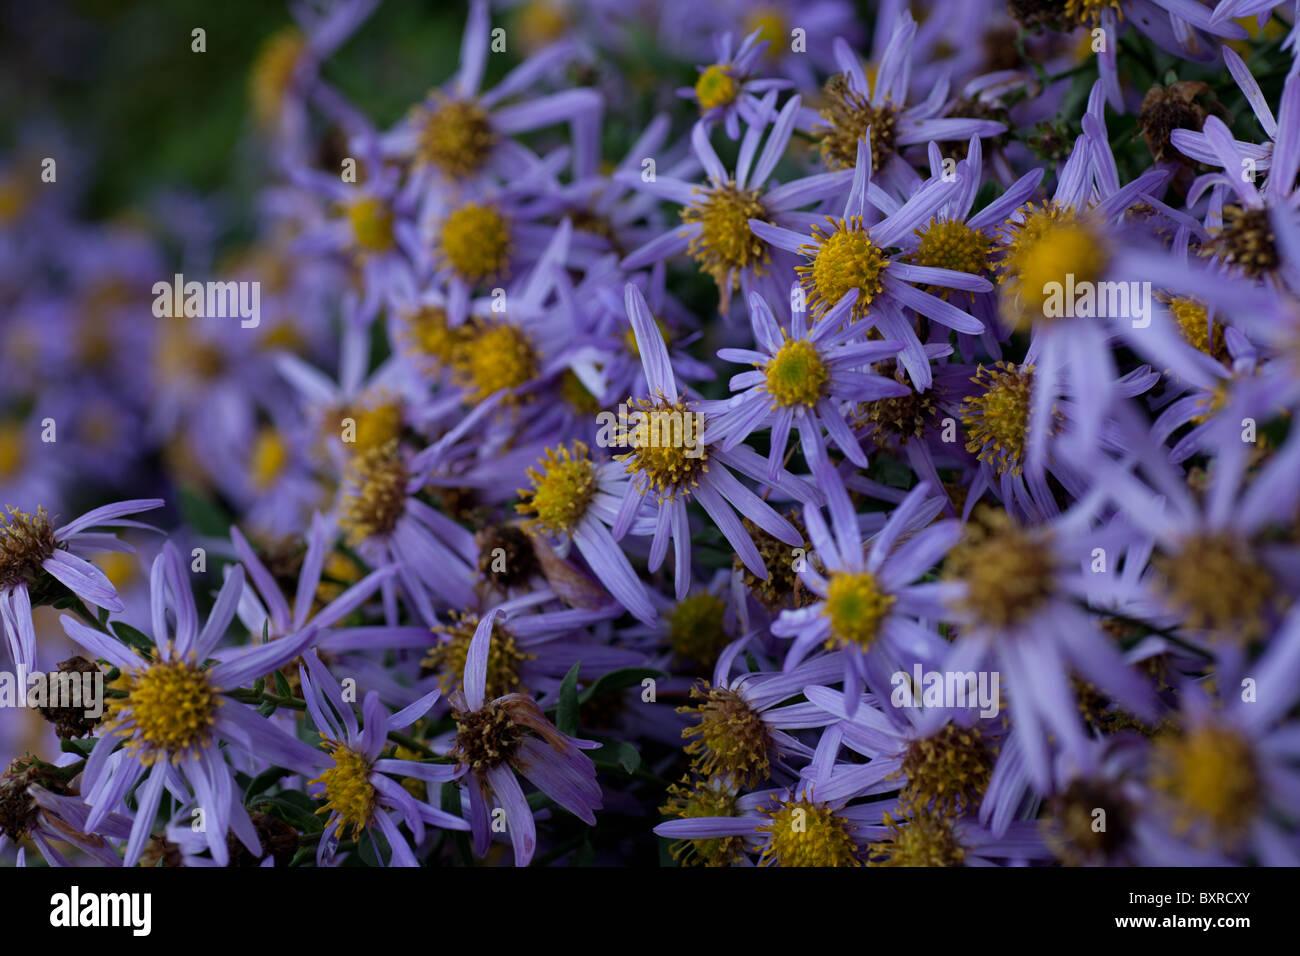 Purple daisy type flowers stock photos purple daisy type flowers purple daisy type flowers in a bush stock image dhlflorist Images